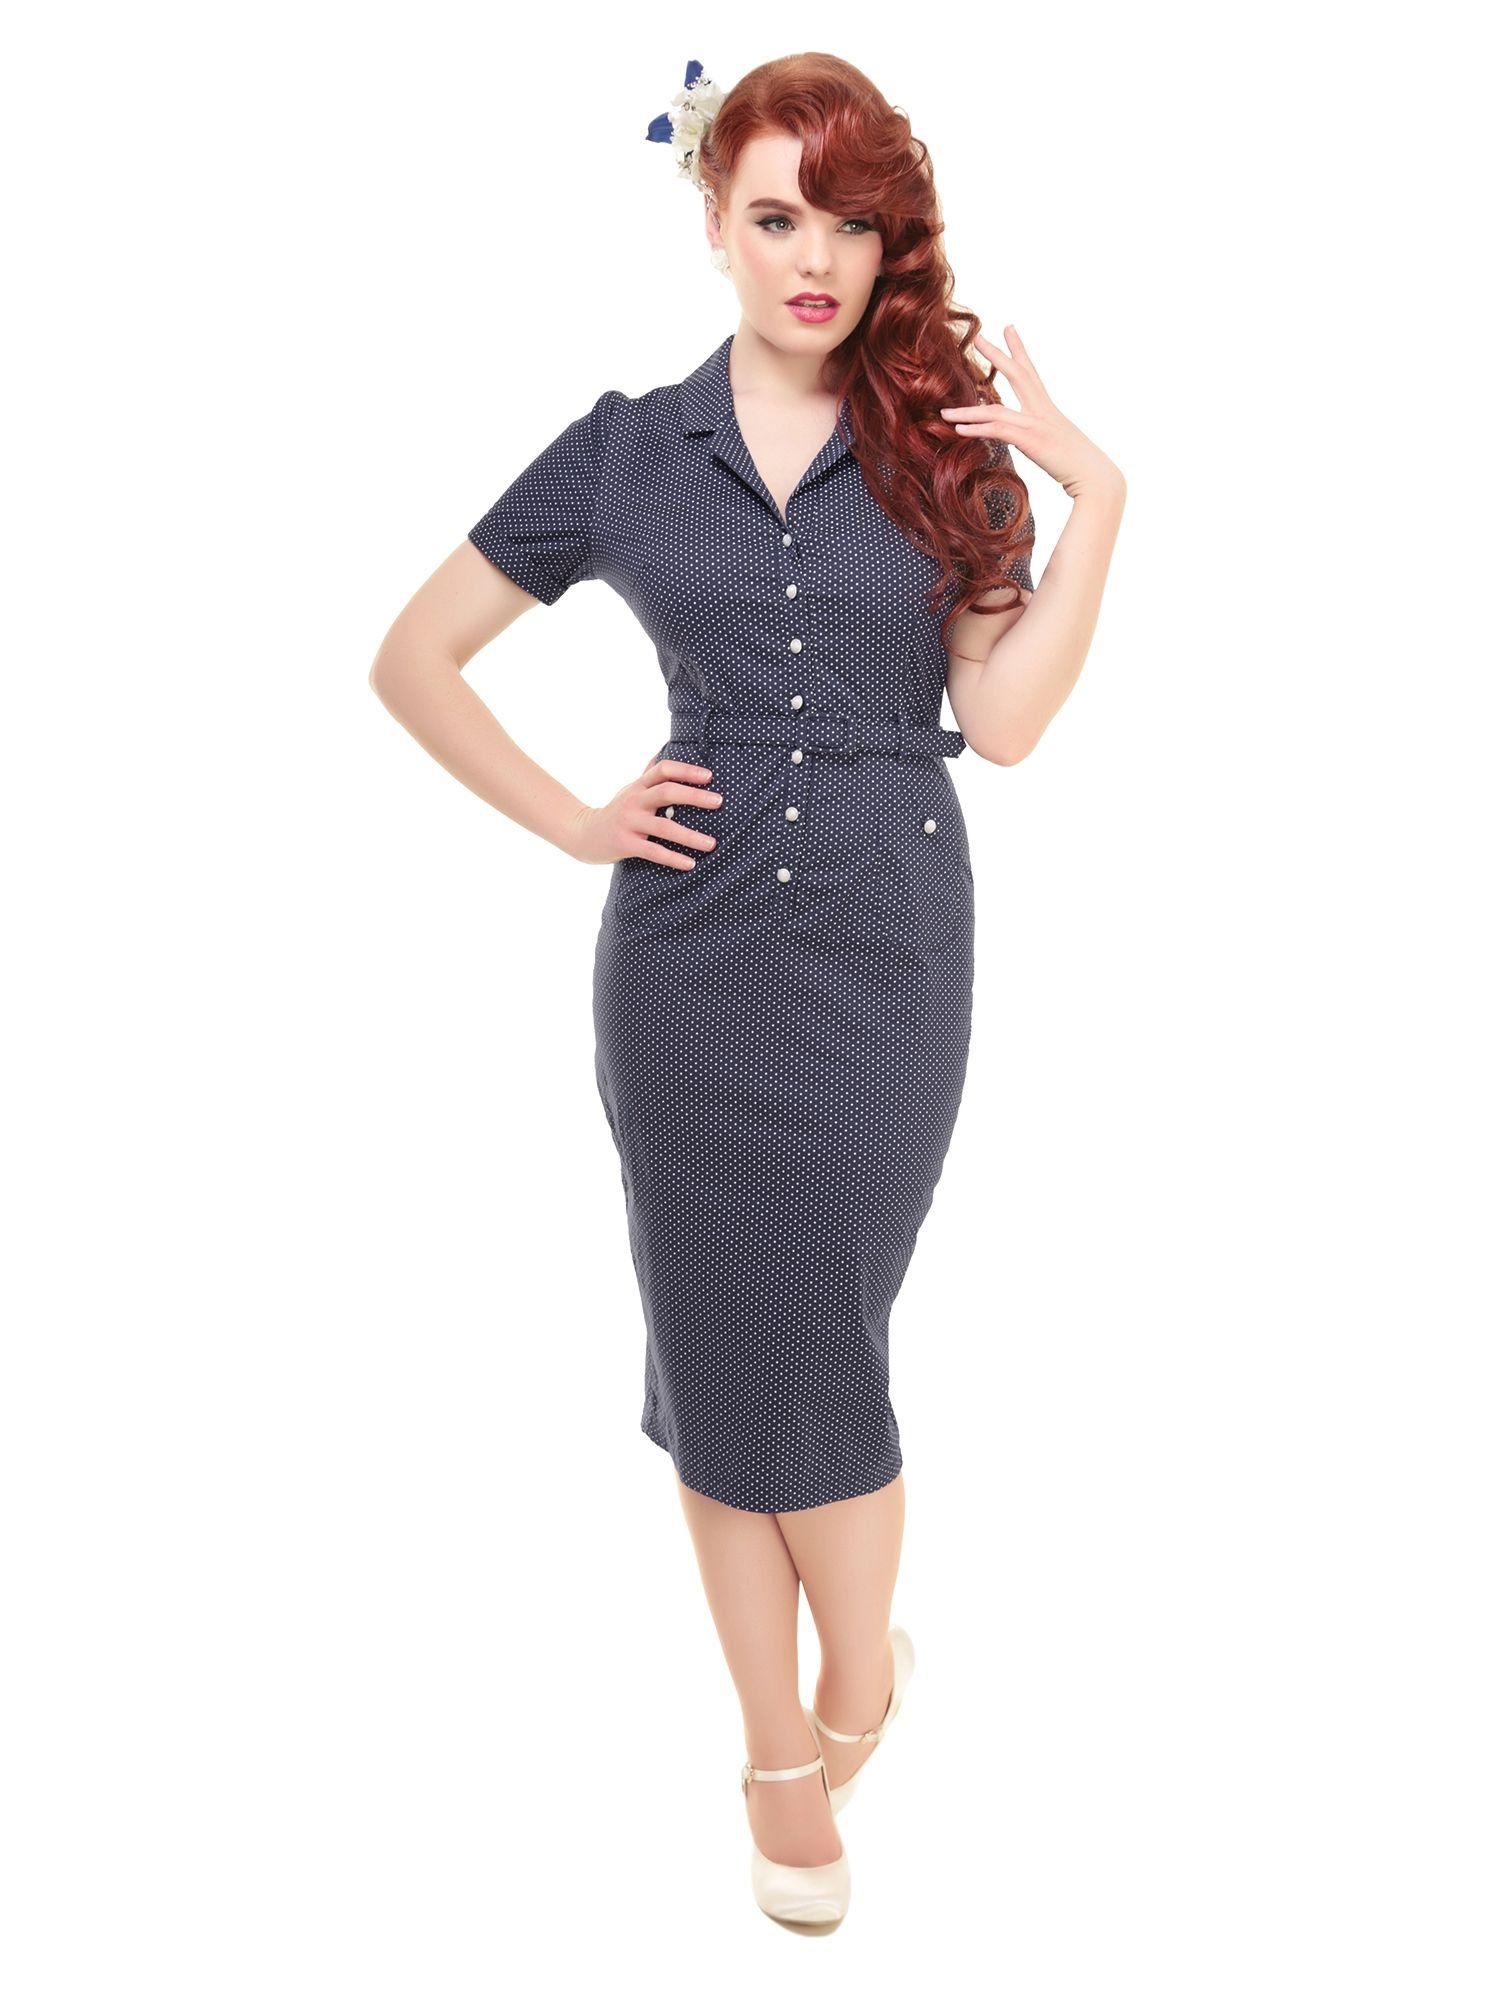 Caterina Mini Polka Dot Pencil Dress 0 | Work Clothes | Pinterest